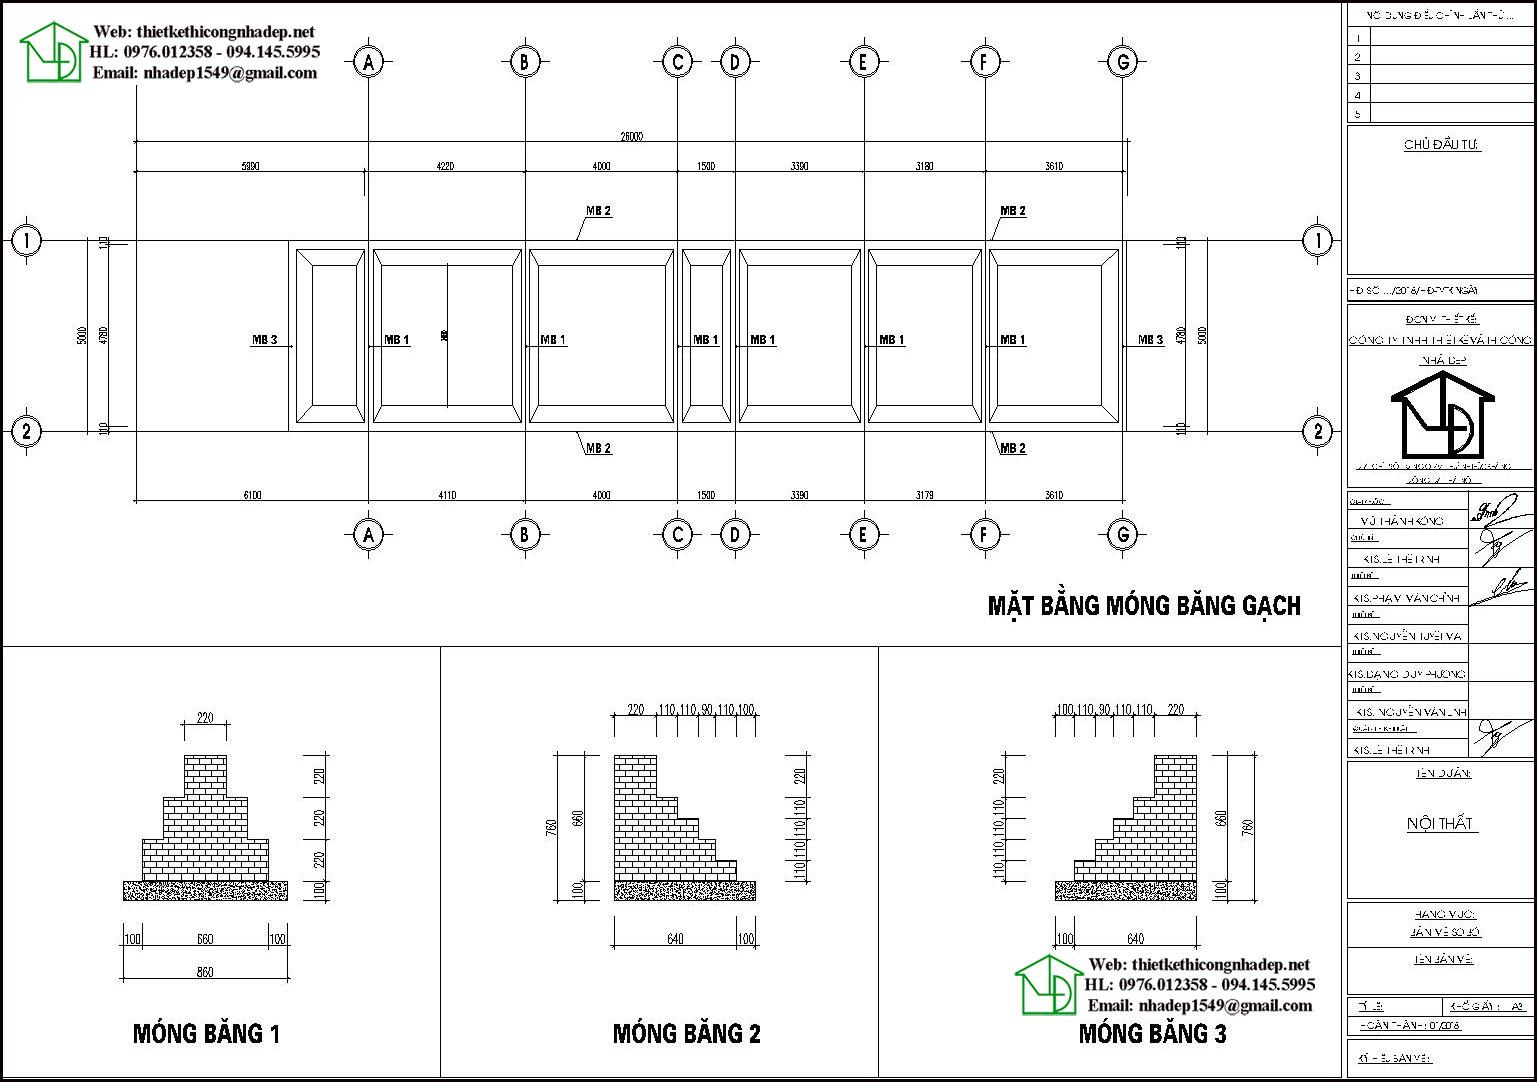 mat-bang-mong-va-chi-tiet-mong-nha-cap-4-NDNC4117